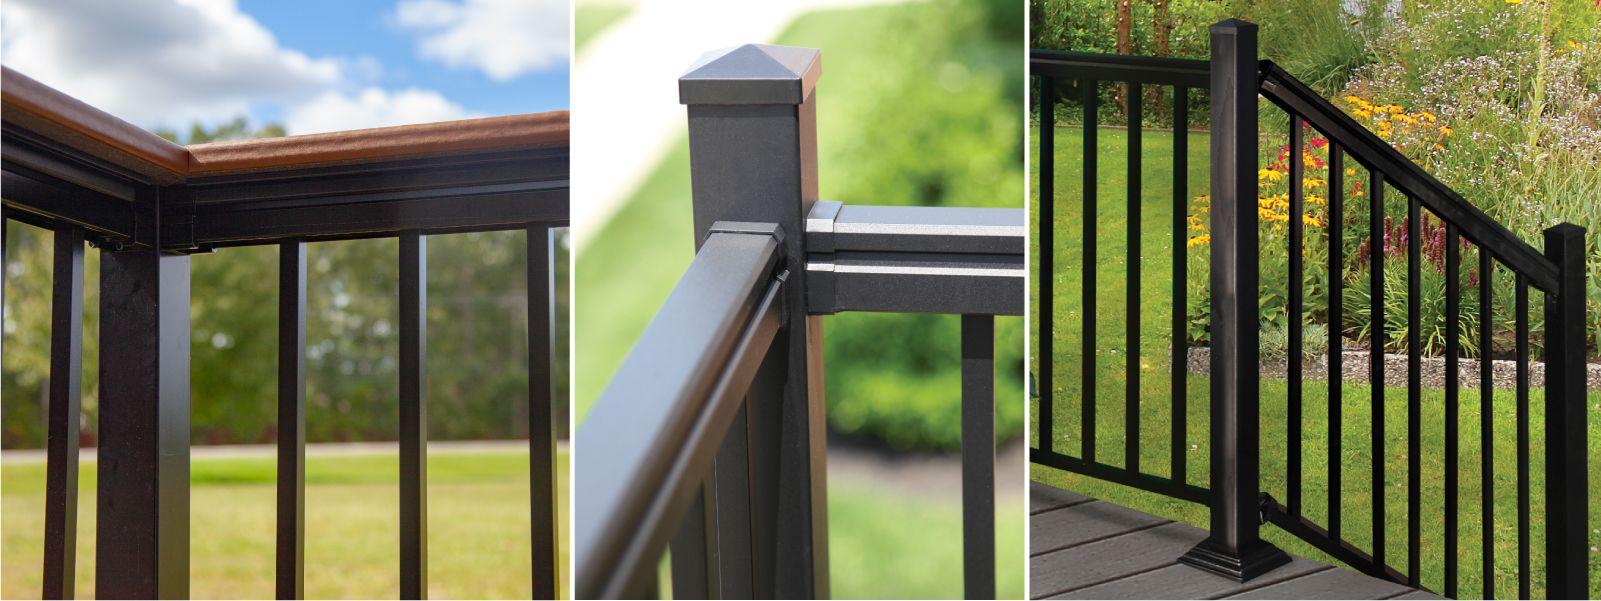 nantucket-railing-triptych.jpg